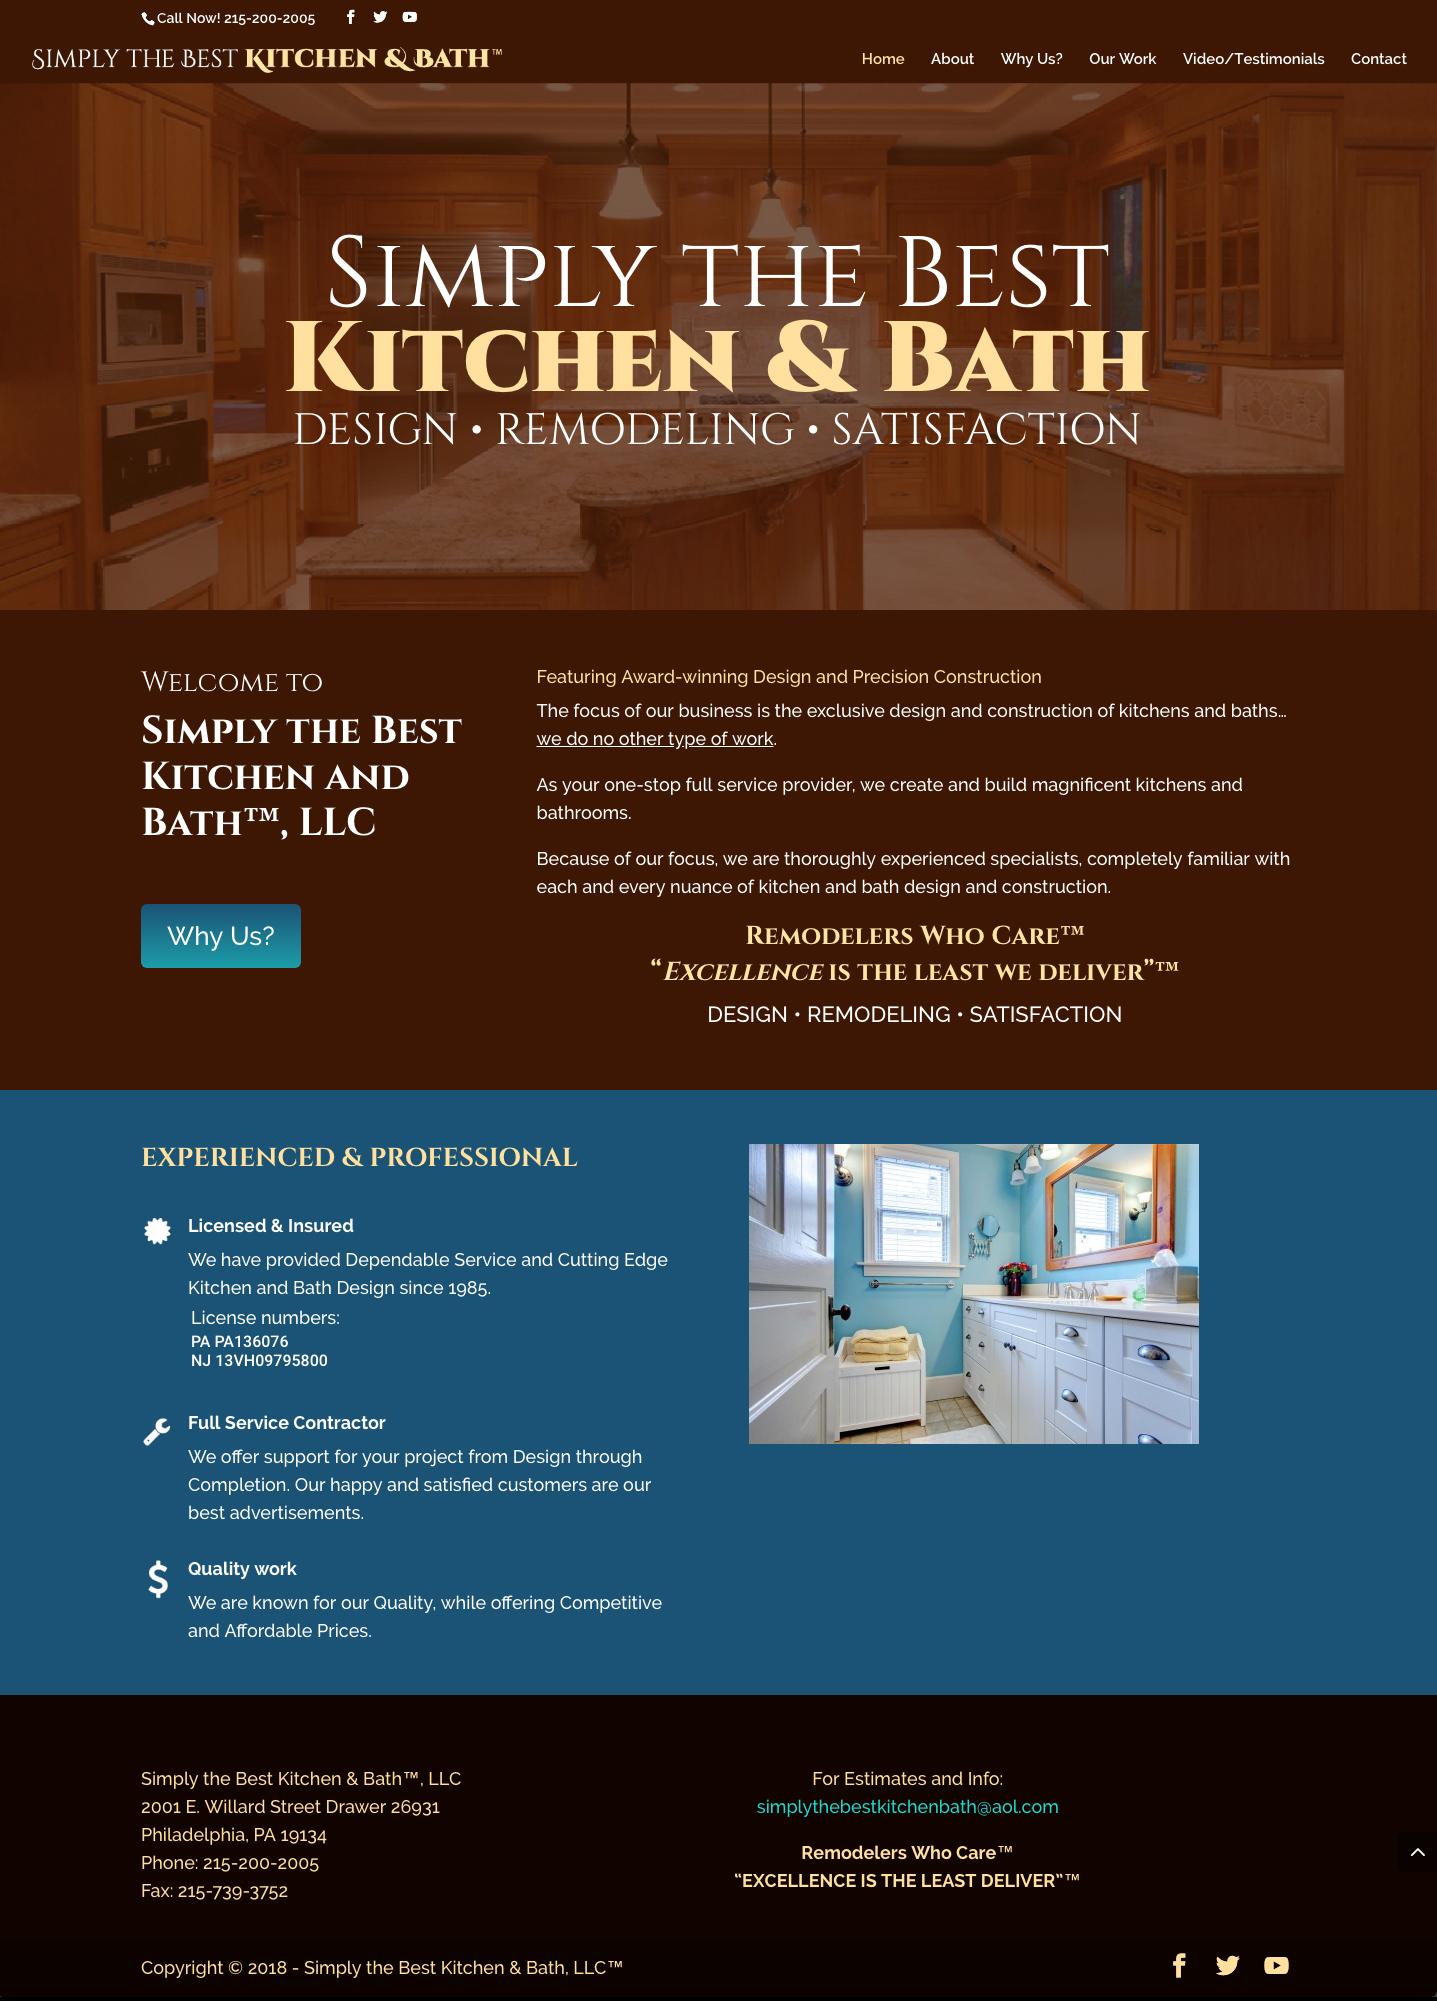 kitchenbathexcellence.com